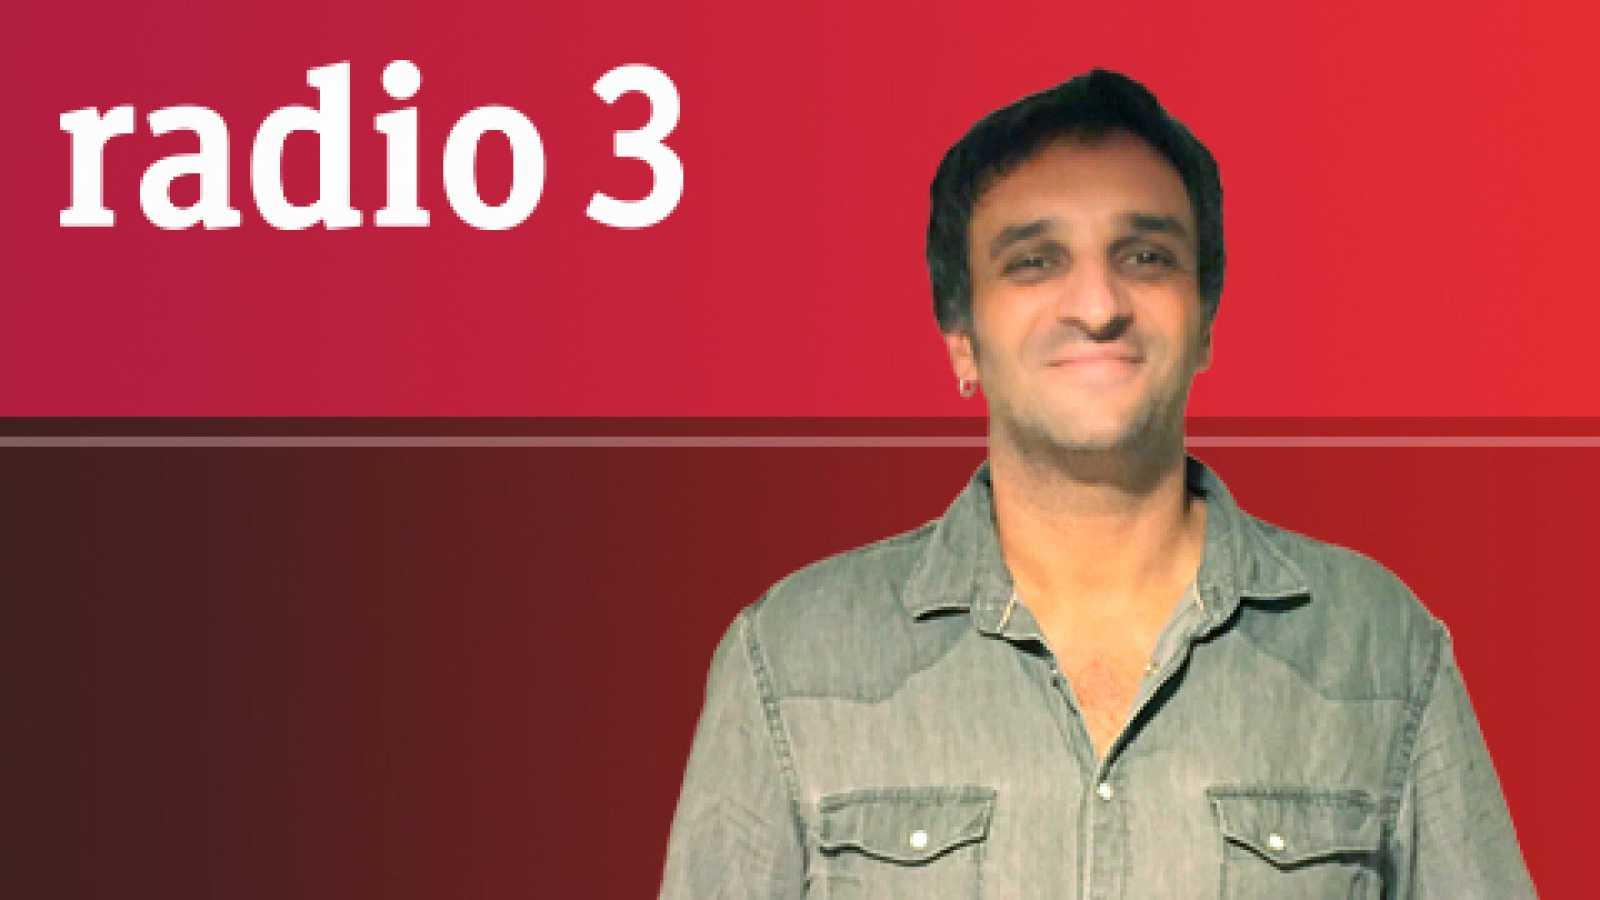 Paralelo 3 en Radio 3 - #318 Parrenin & Weinrich / DJ International (1) - 22/01/21 - escuchar ahora